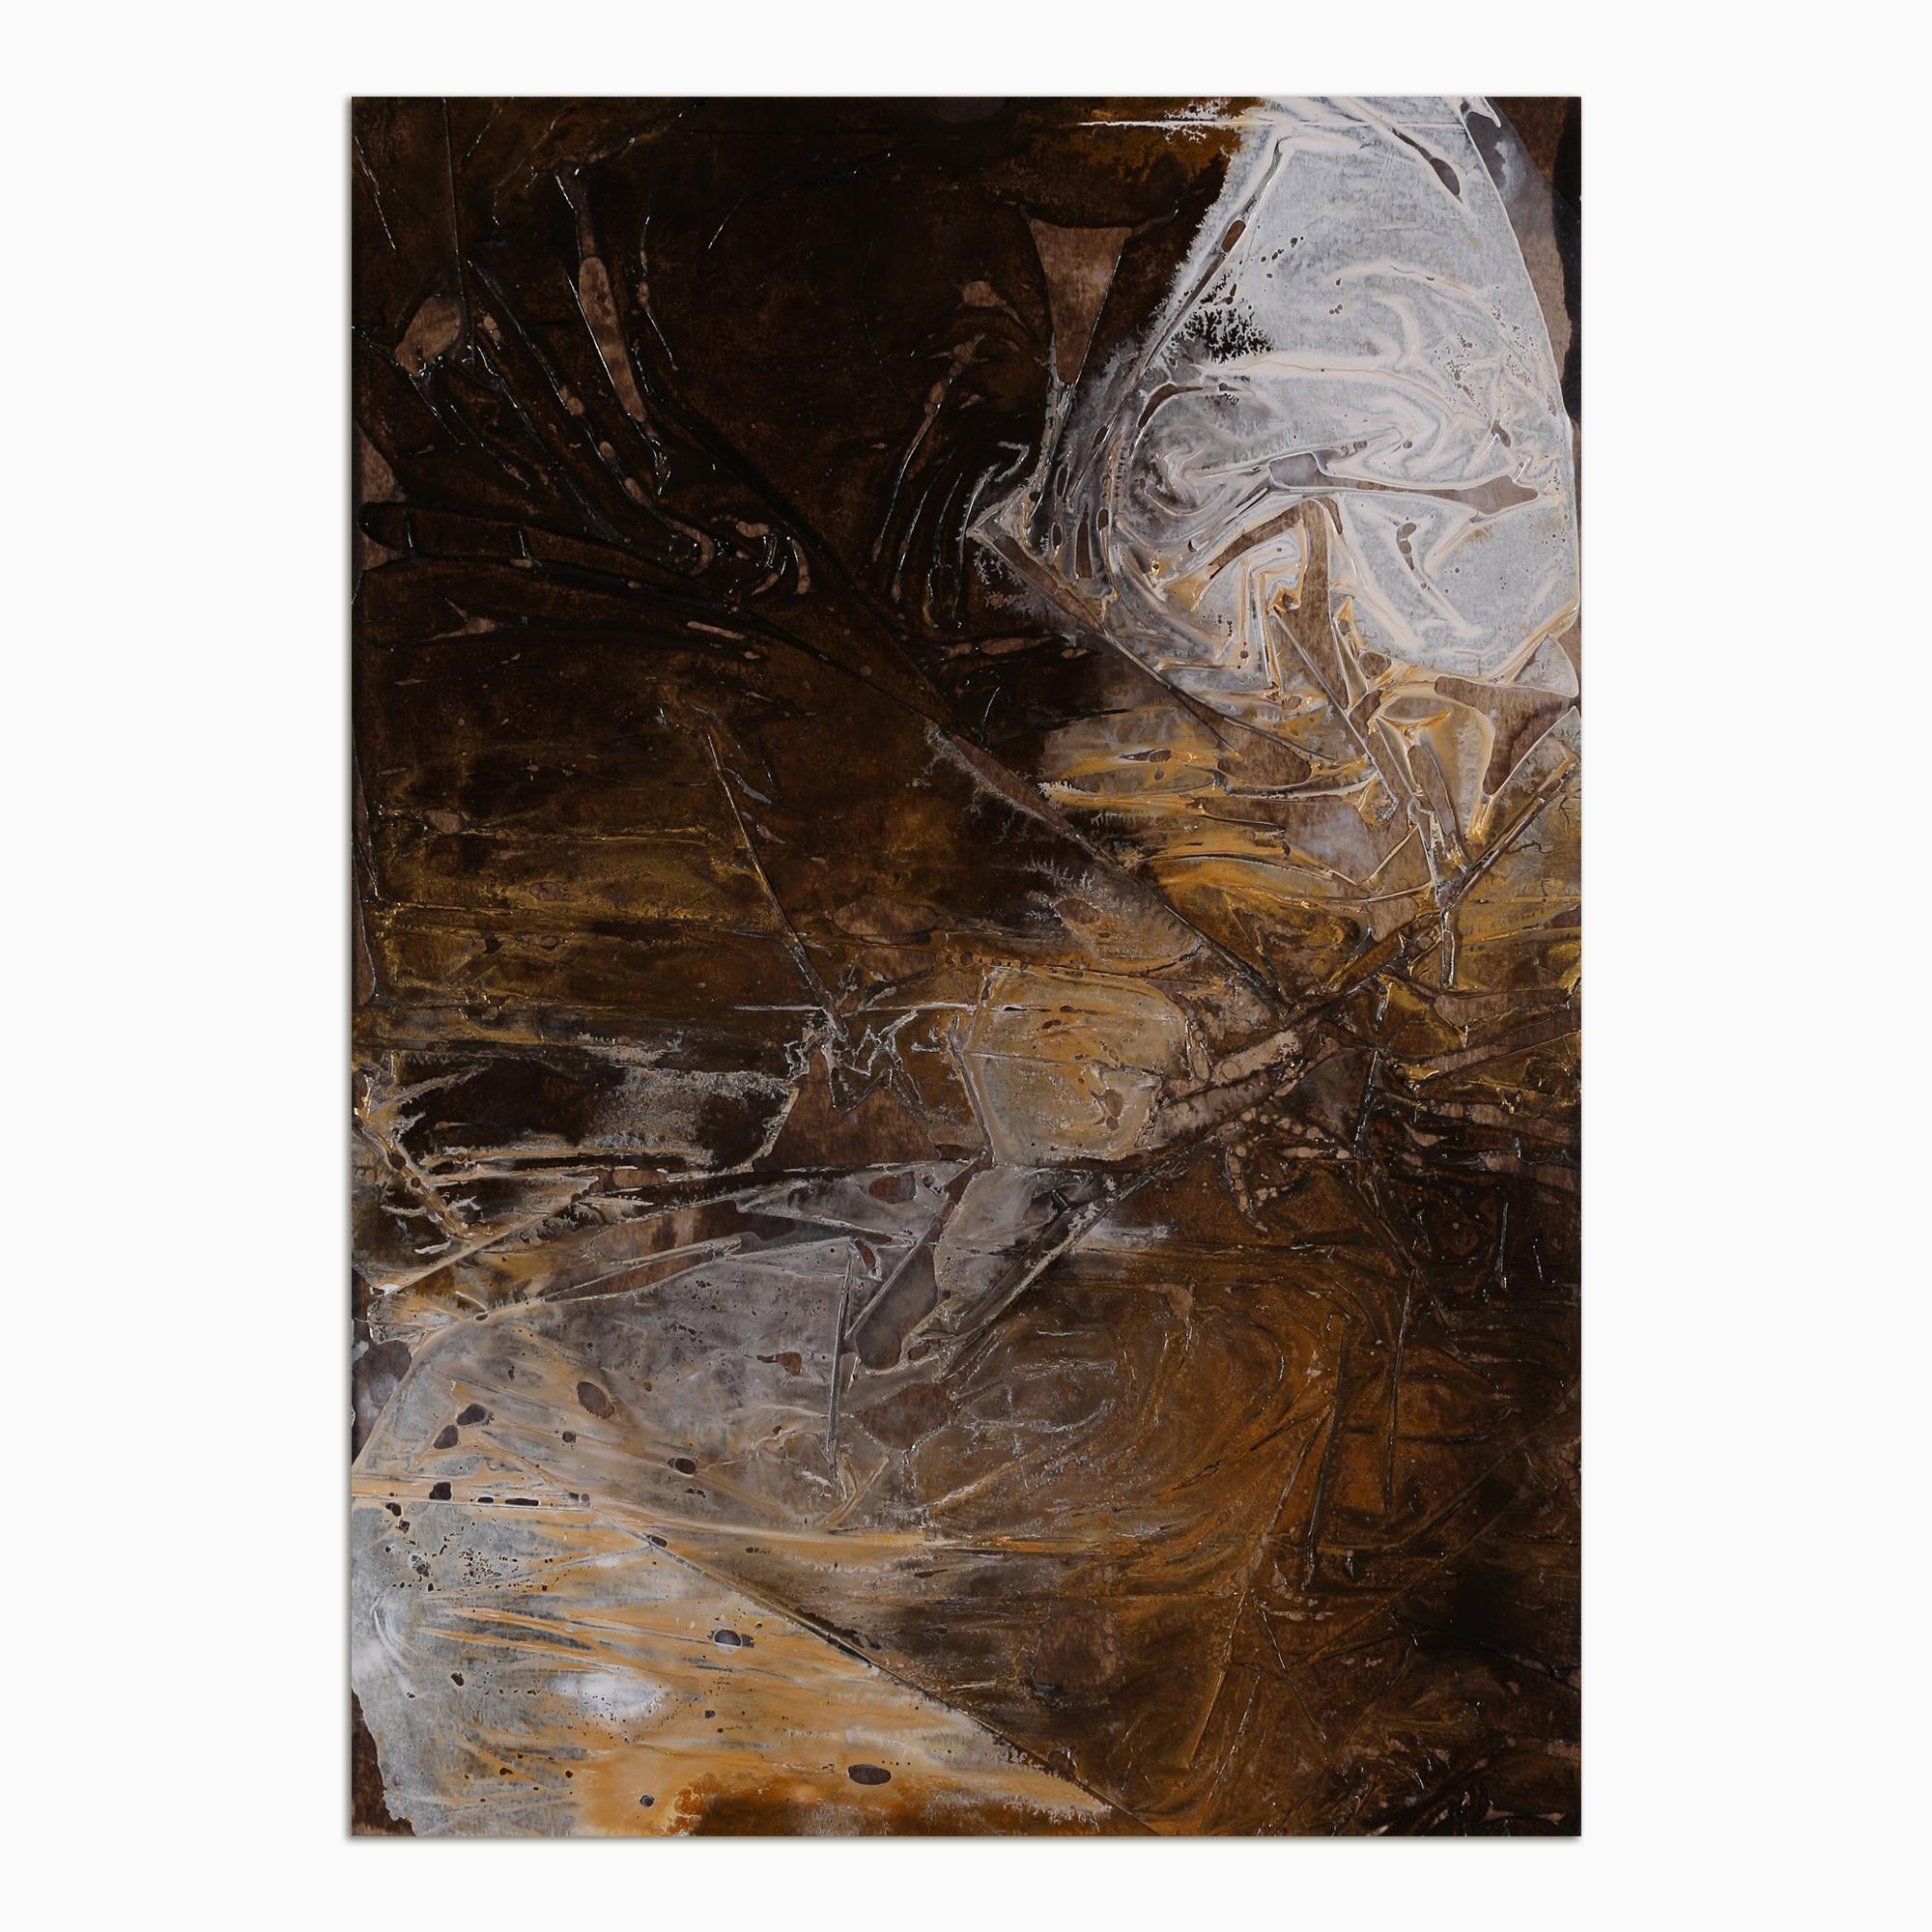 702_jay-paganini_abstract-art_on-paper.jpg